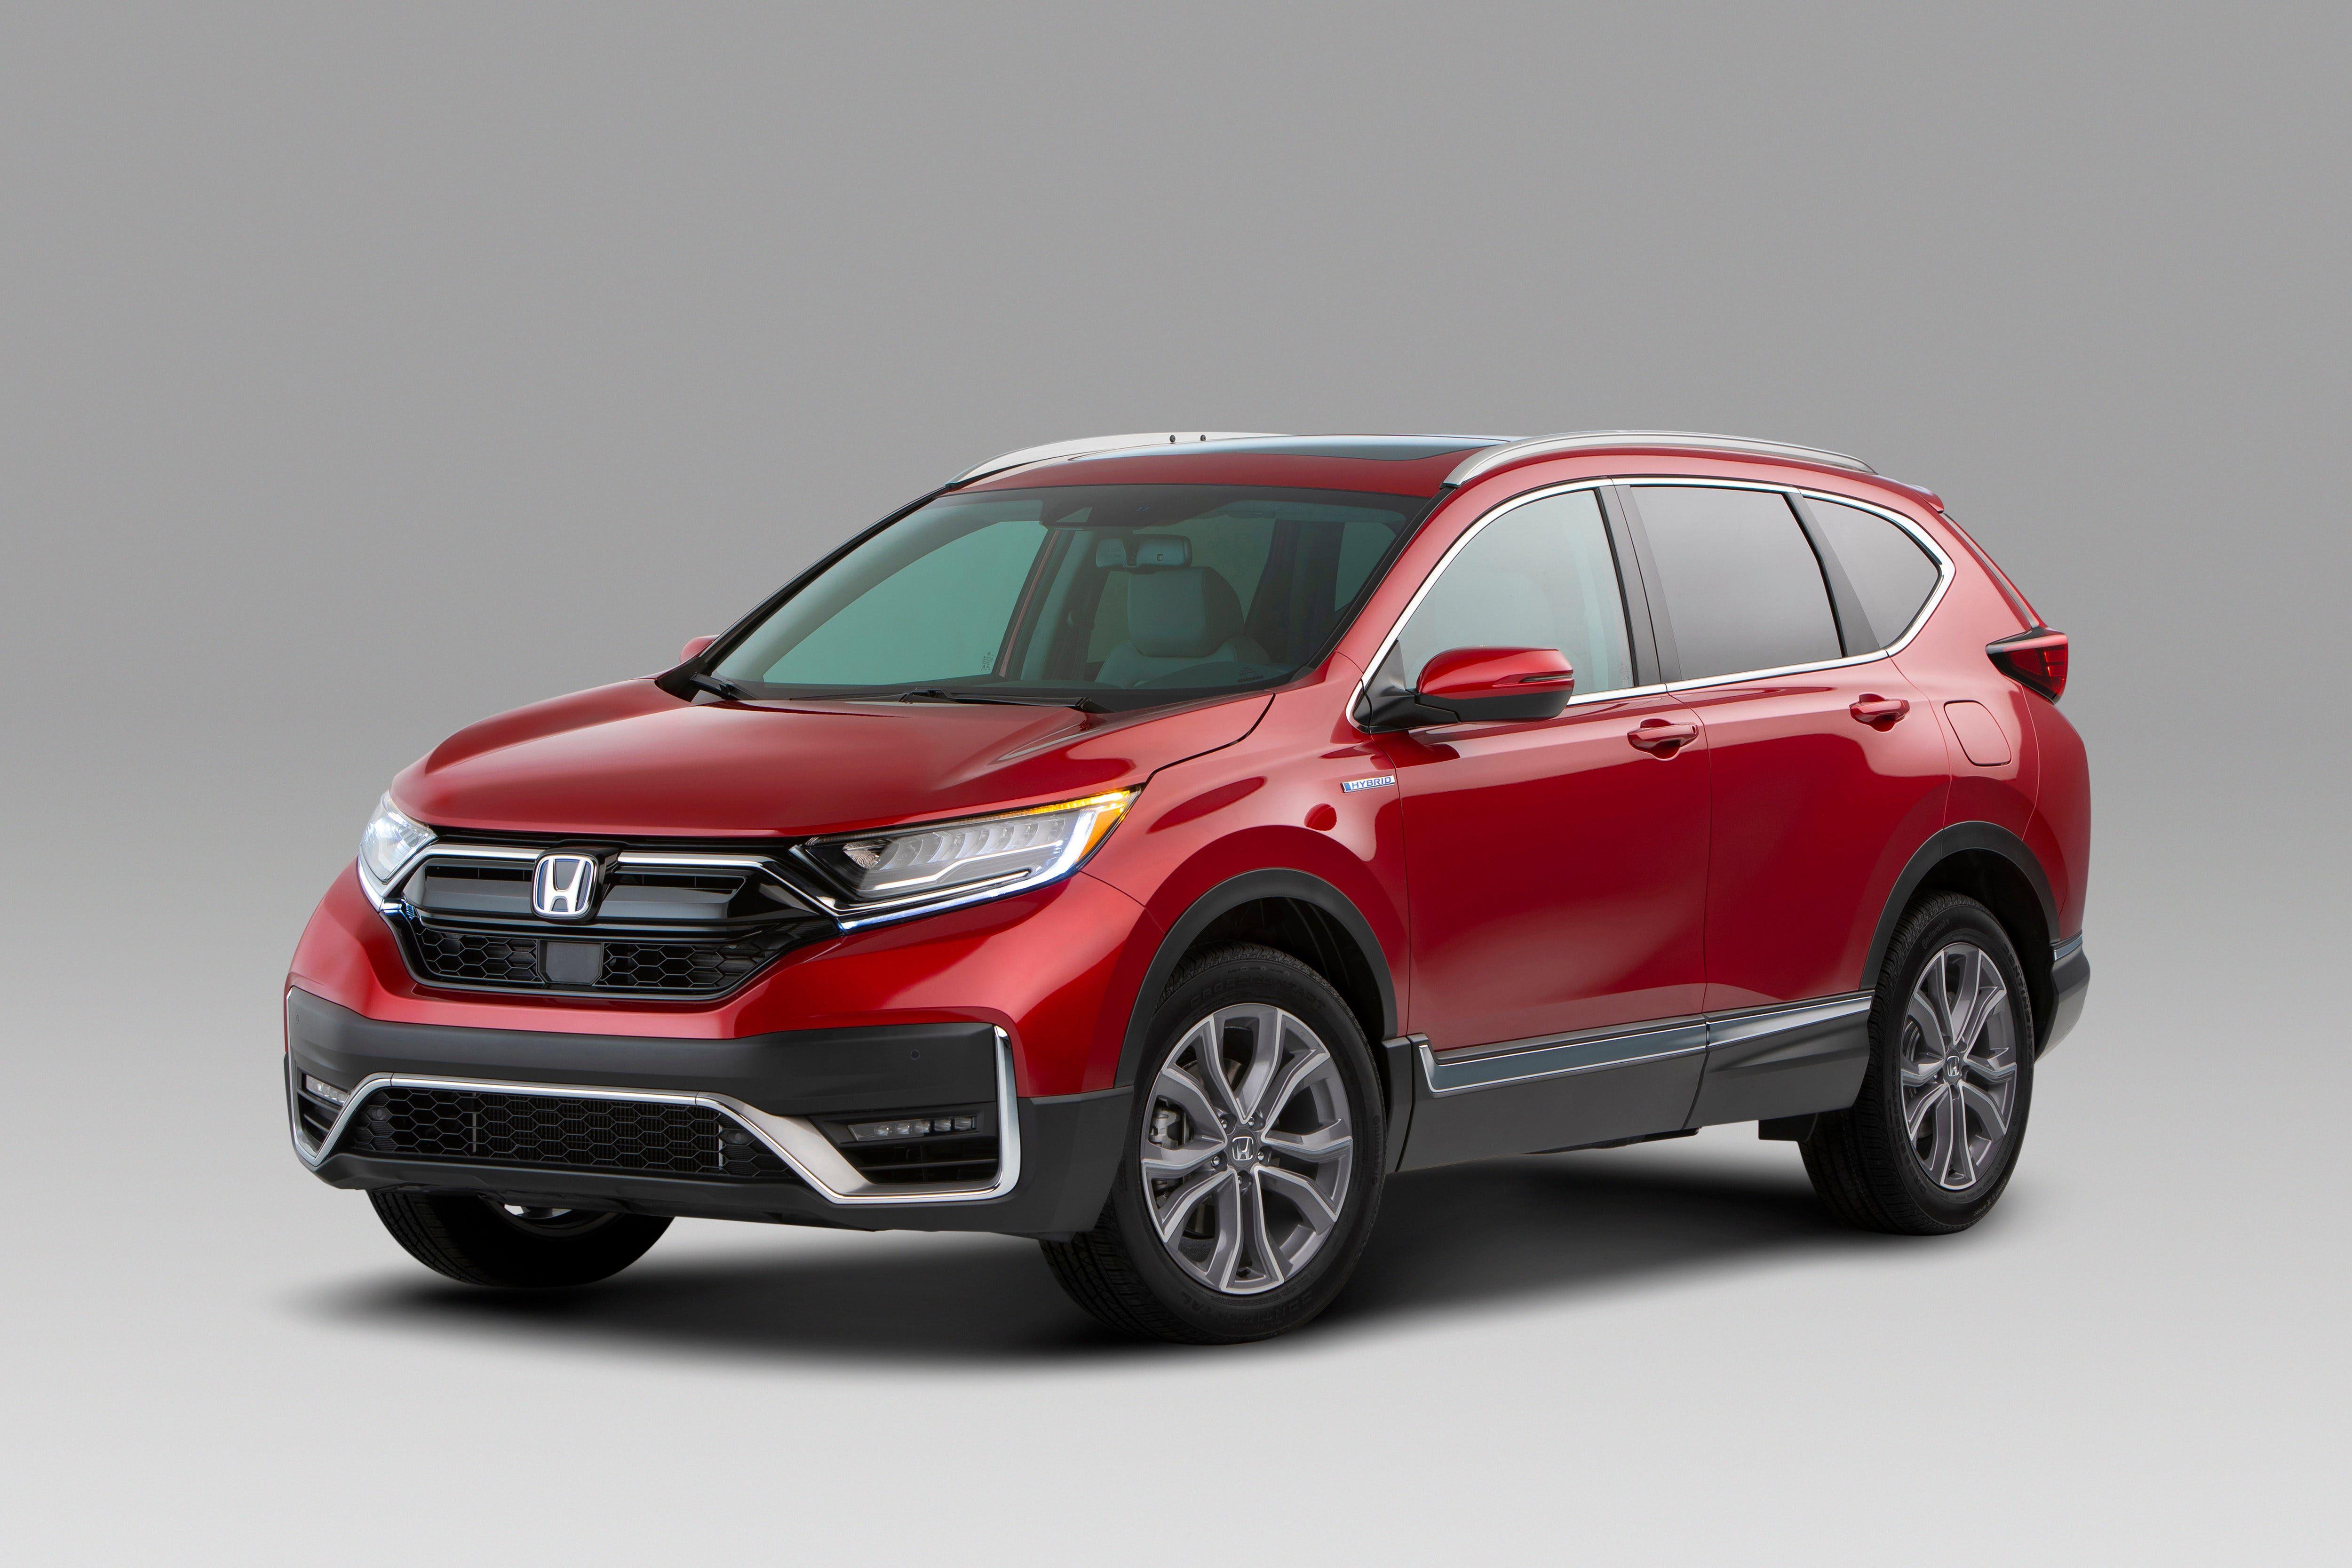 Honda Unveils 2020 Cr V Hybrid In Detroit Says More Electrics Are On Way Honda Crv Hybrid Honda Cr Honda Crv